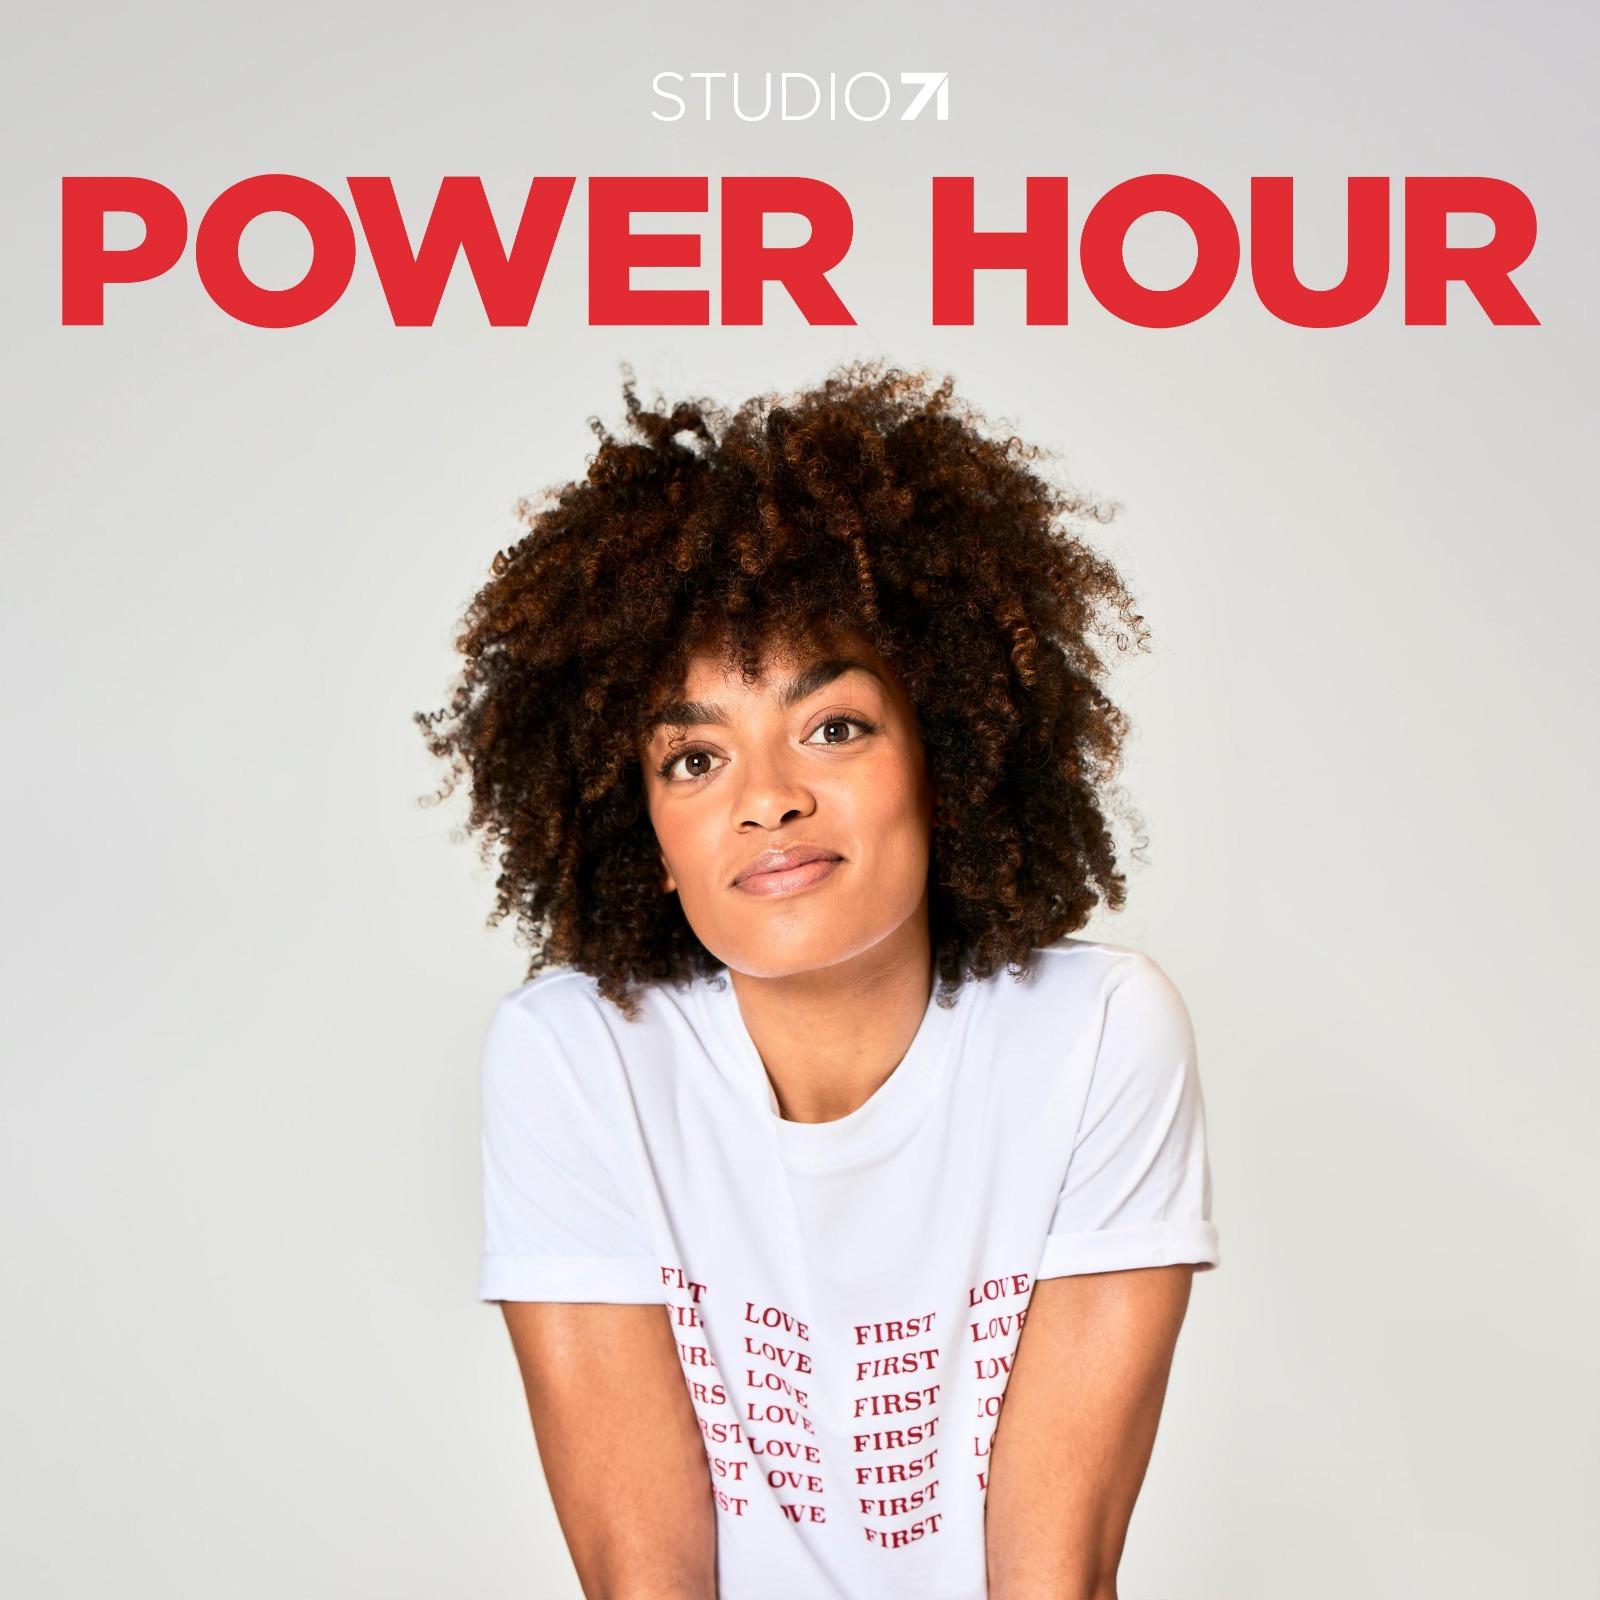 studio71-power-hour-artwork